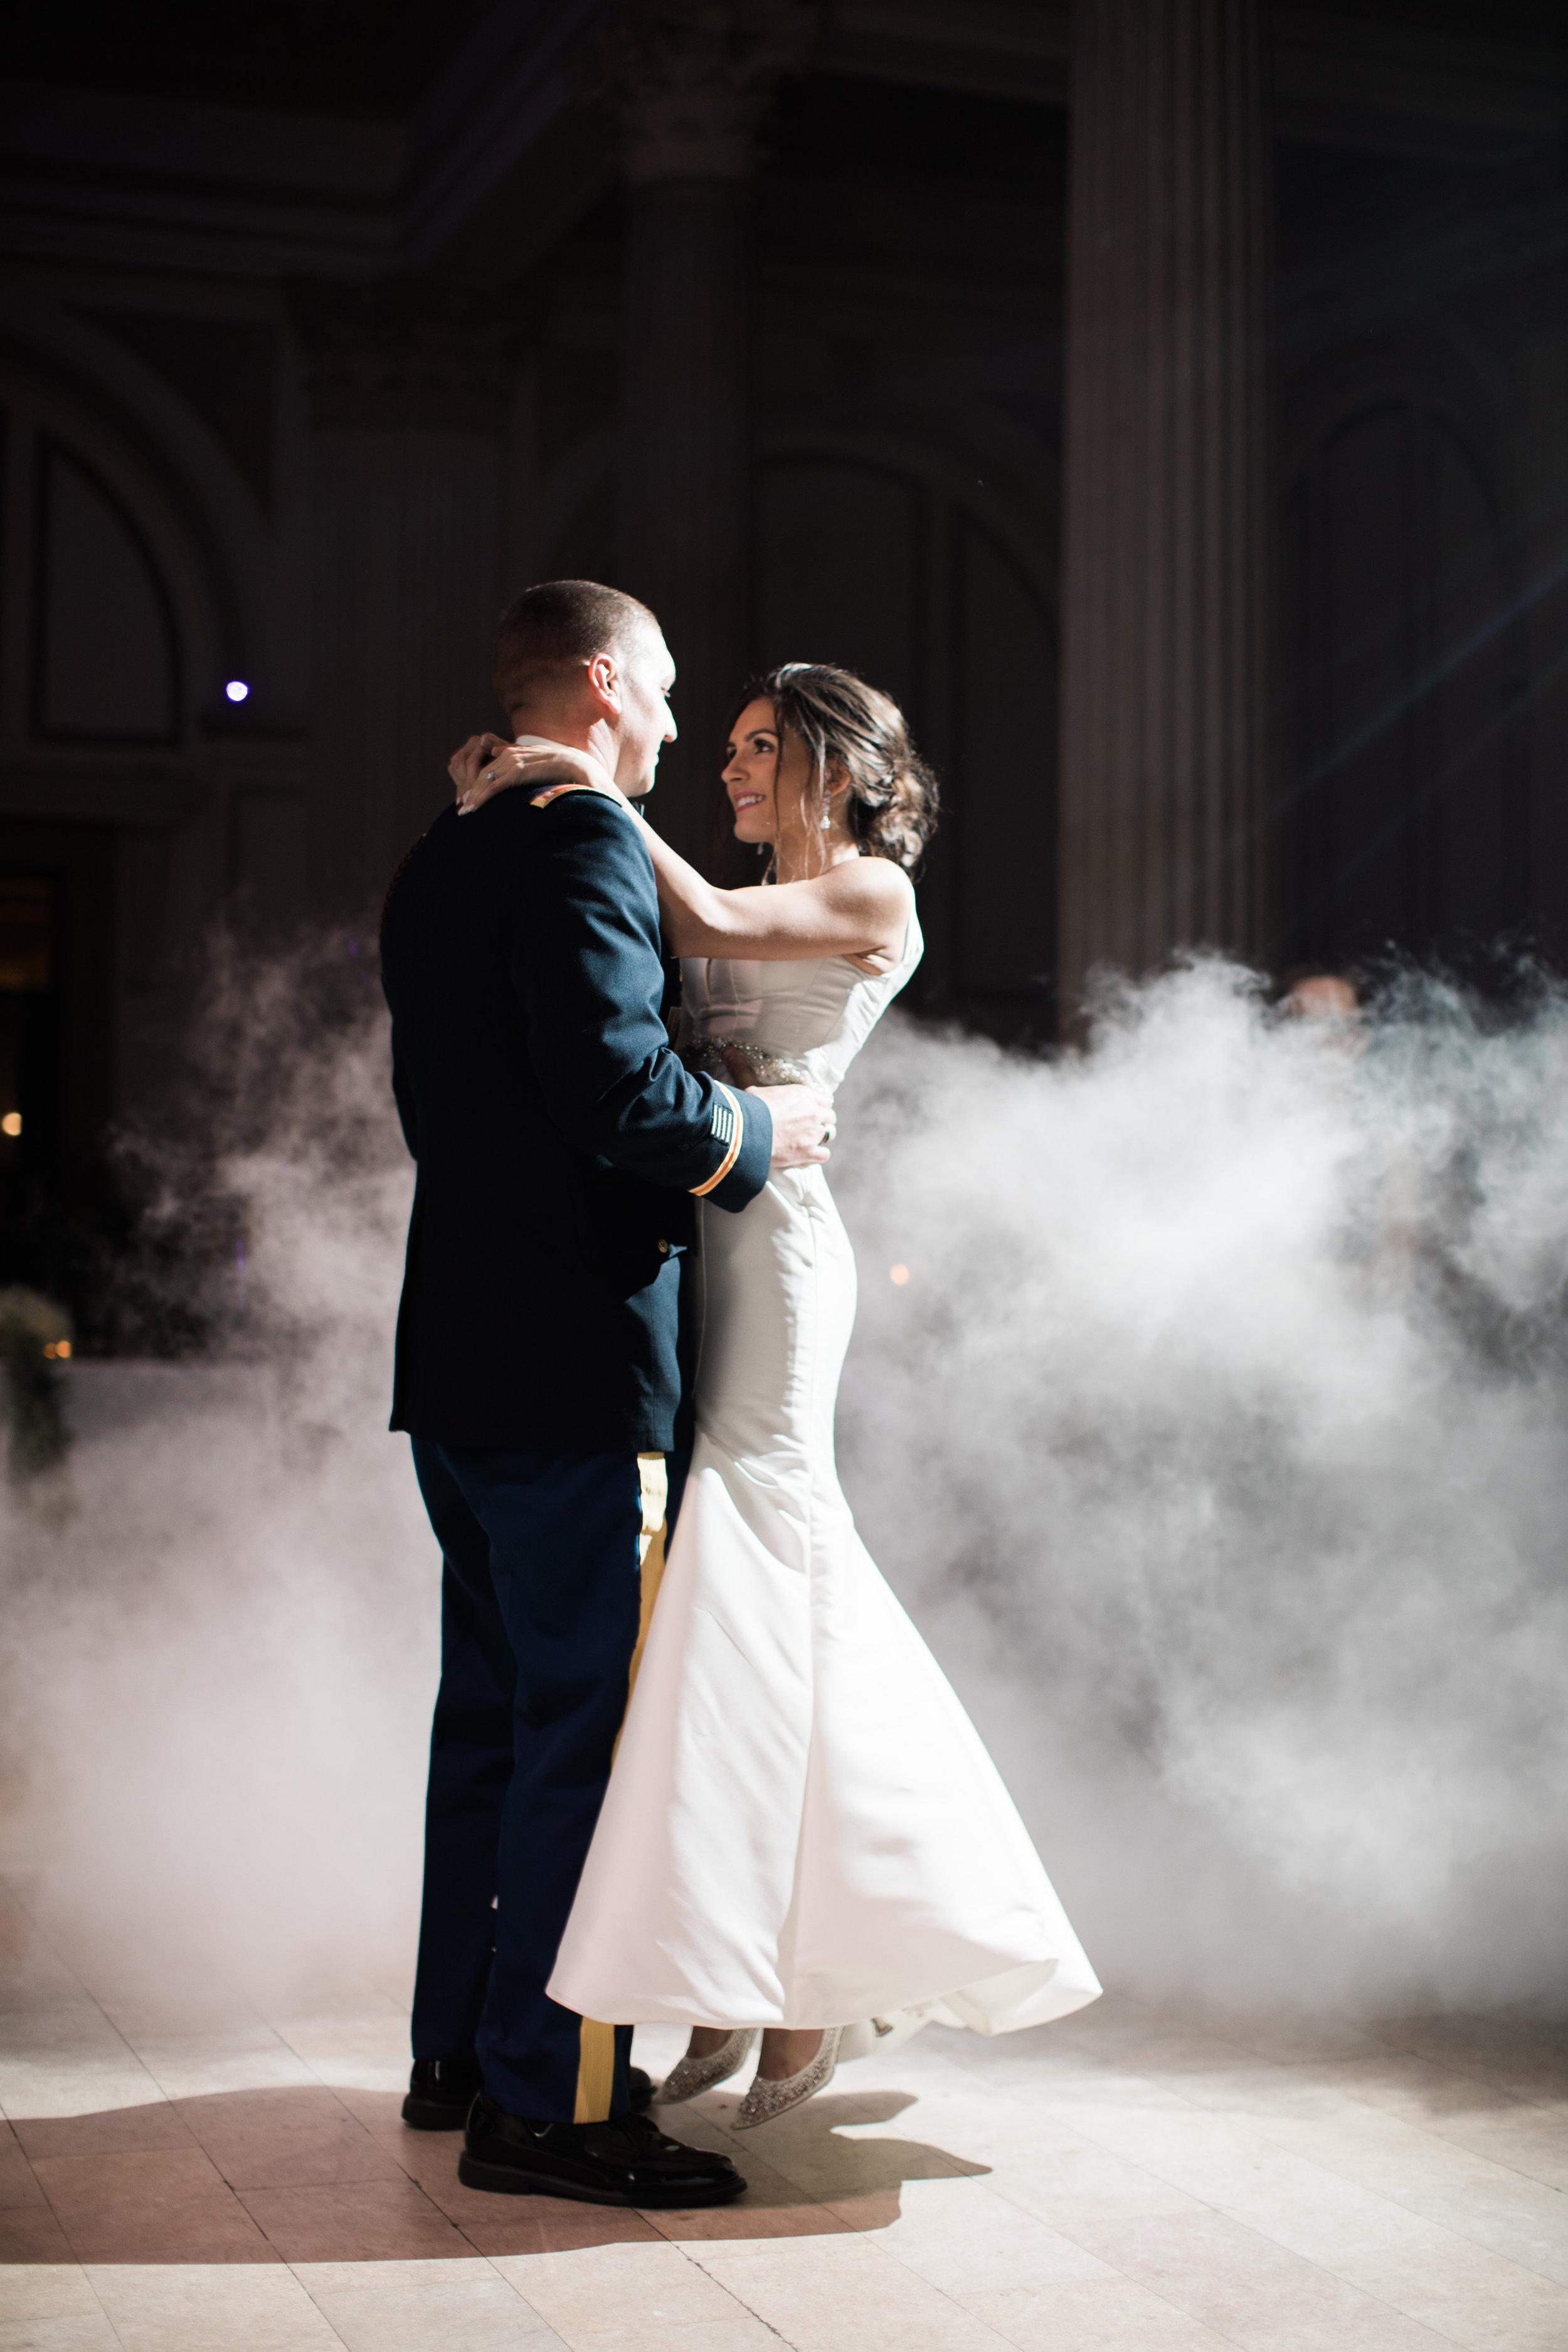 Taylor_TJ_St_Augustine_Treasury_on_the_Plaza_Wedding_Photography__0054_-54.jpg